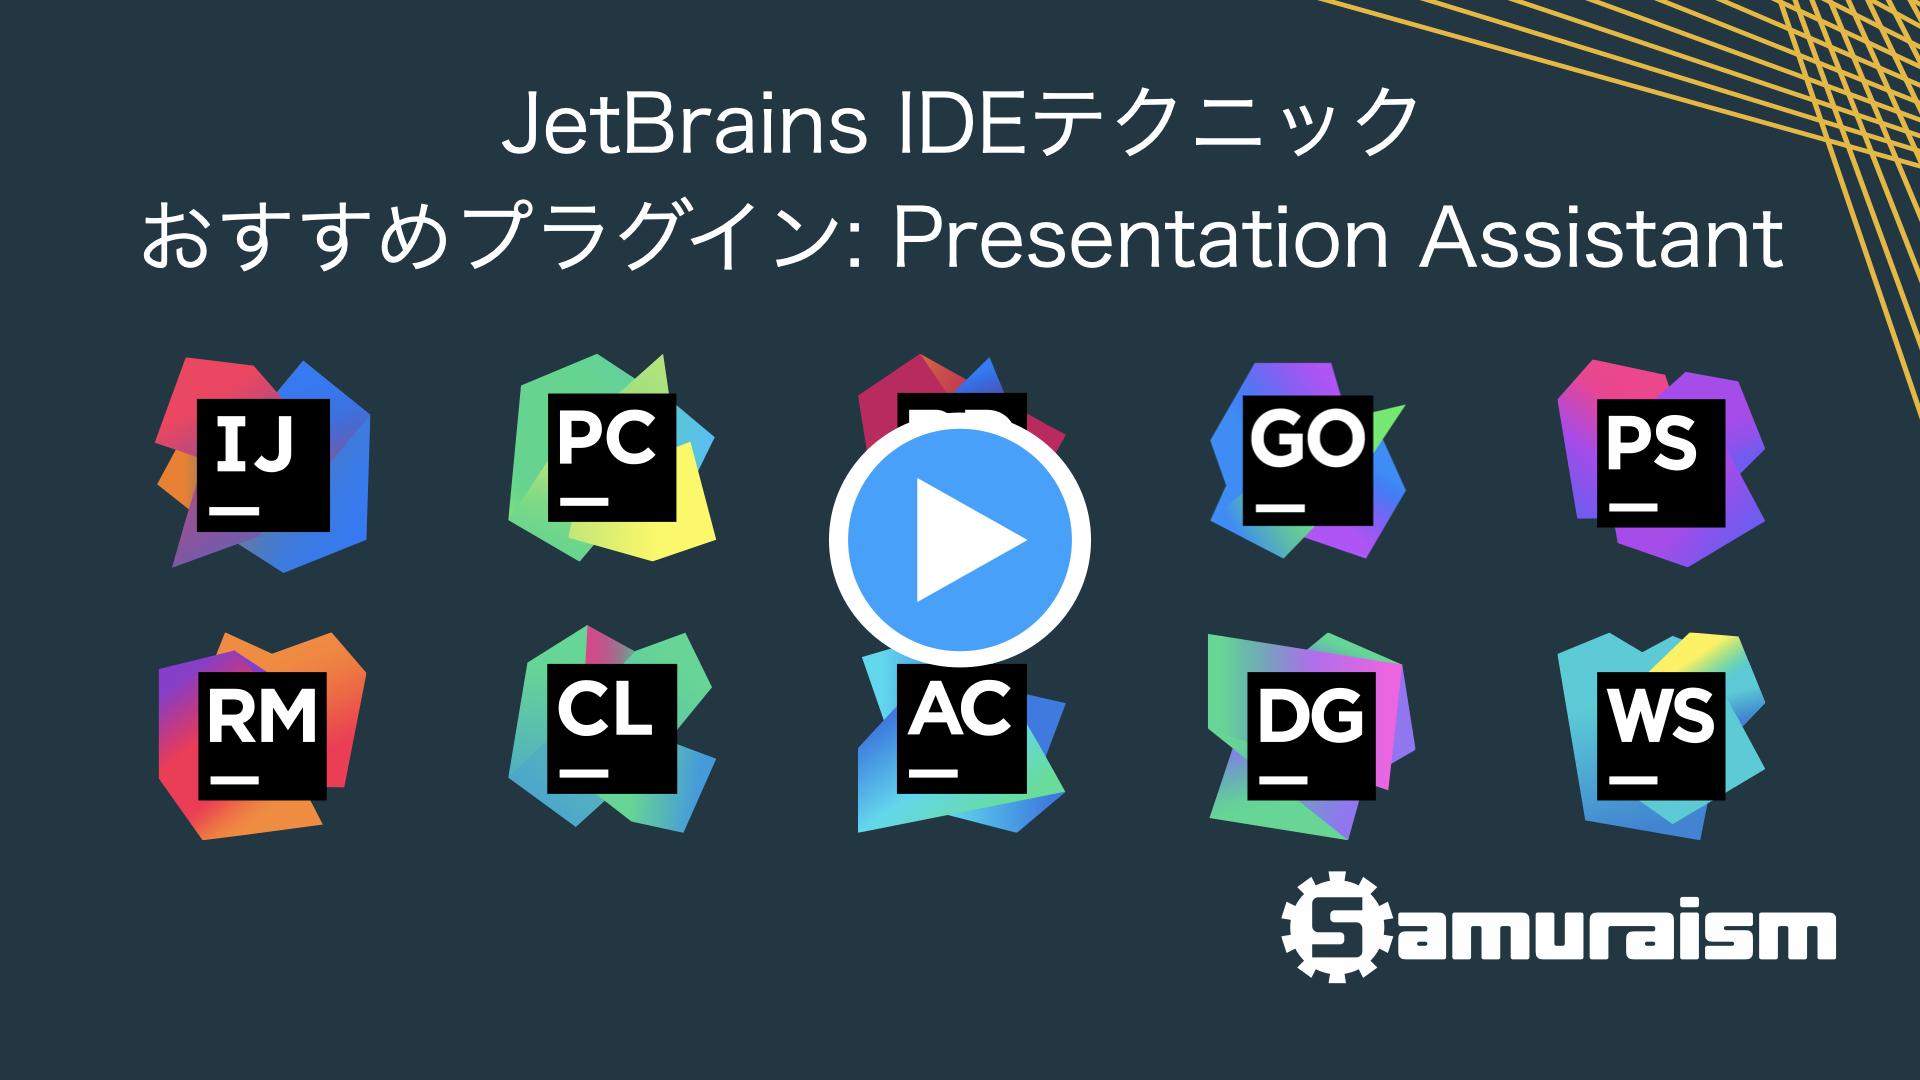 #JetBrainsIDEテクニック – オススメプラグイン: Presentation Assistant